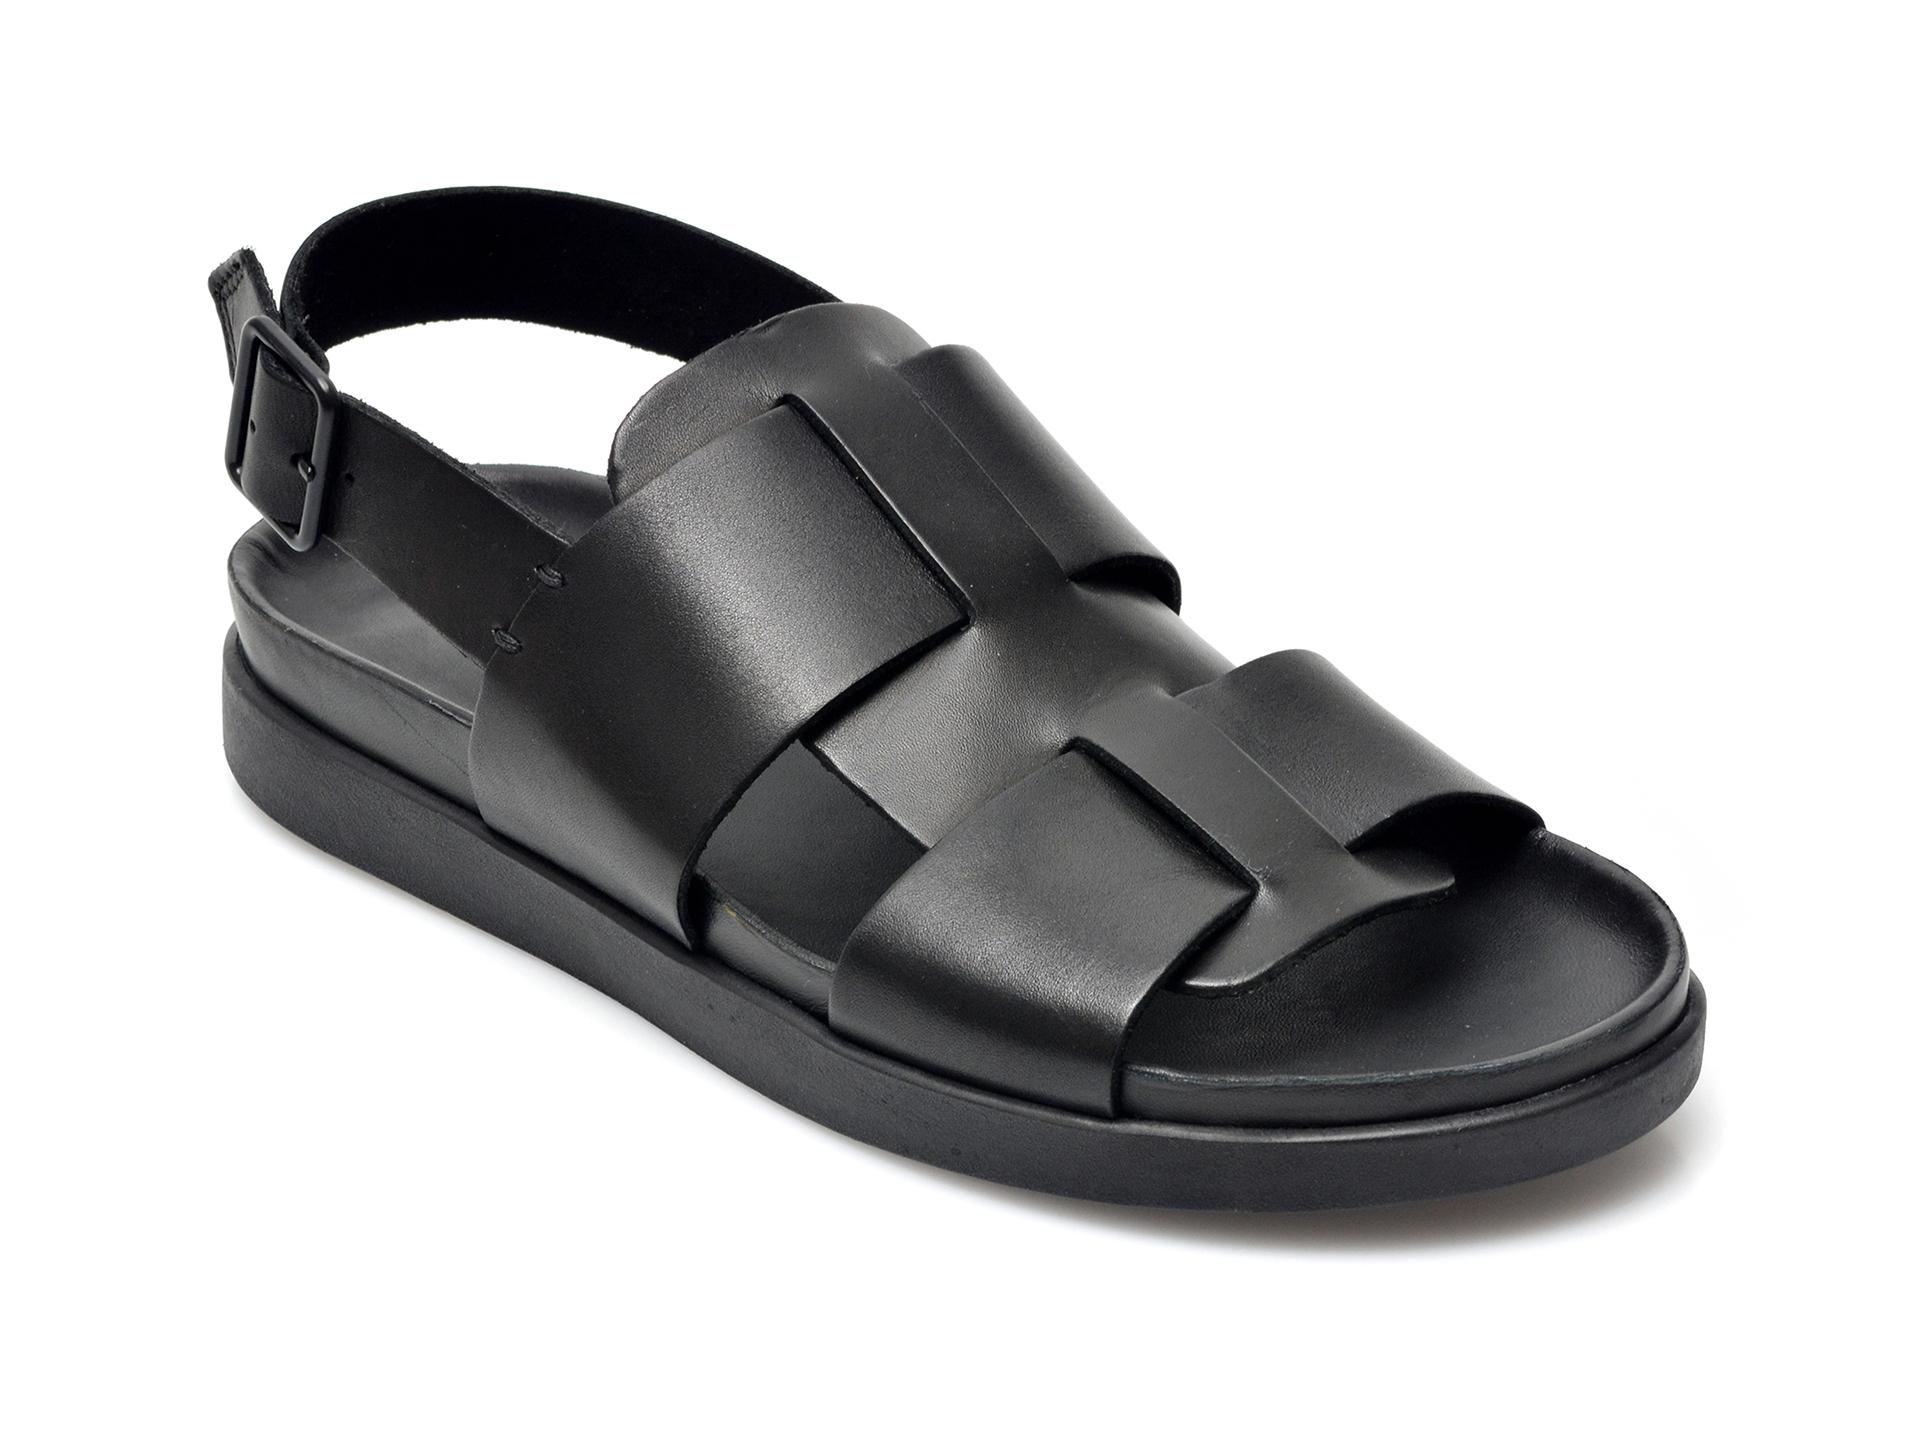 Sandale CLARKS negre, Brixby Shore, din piele naturala